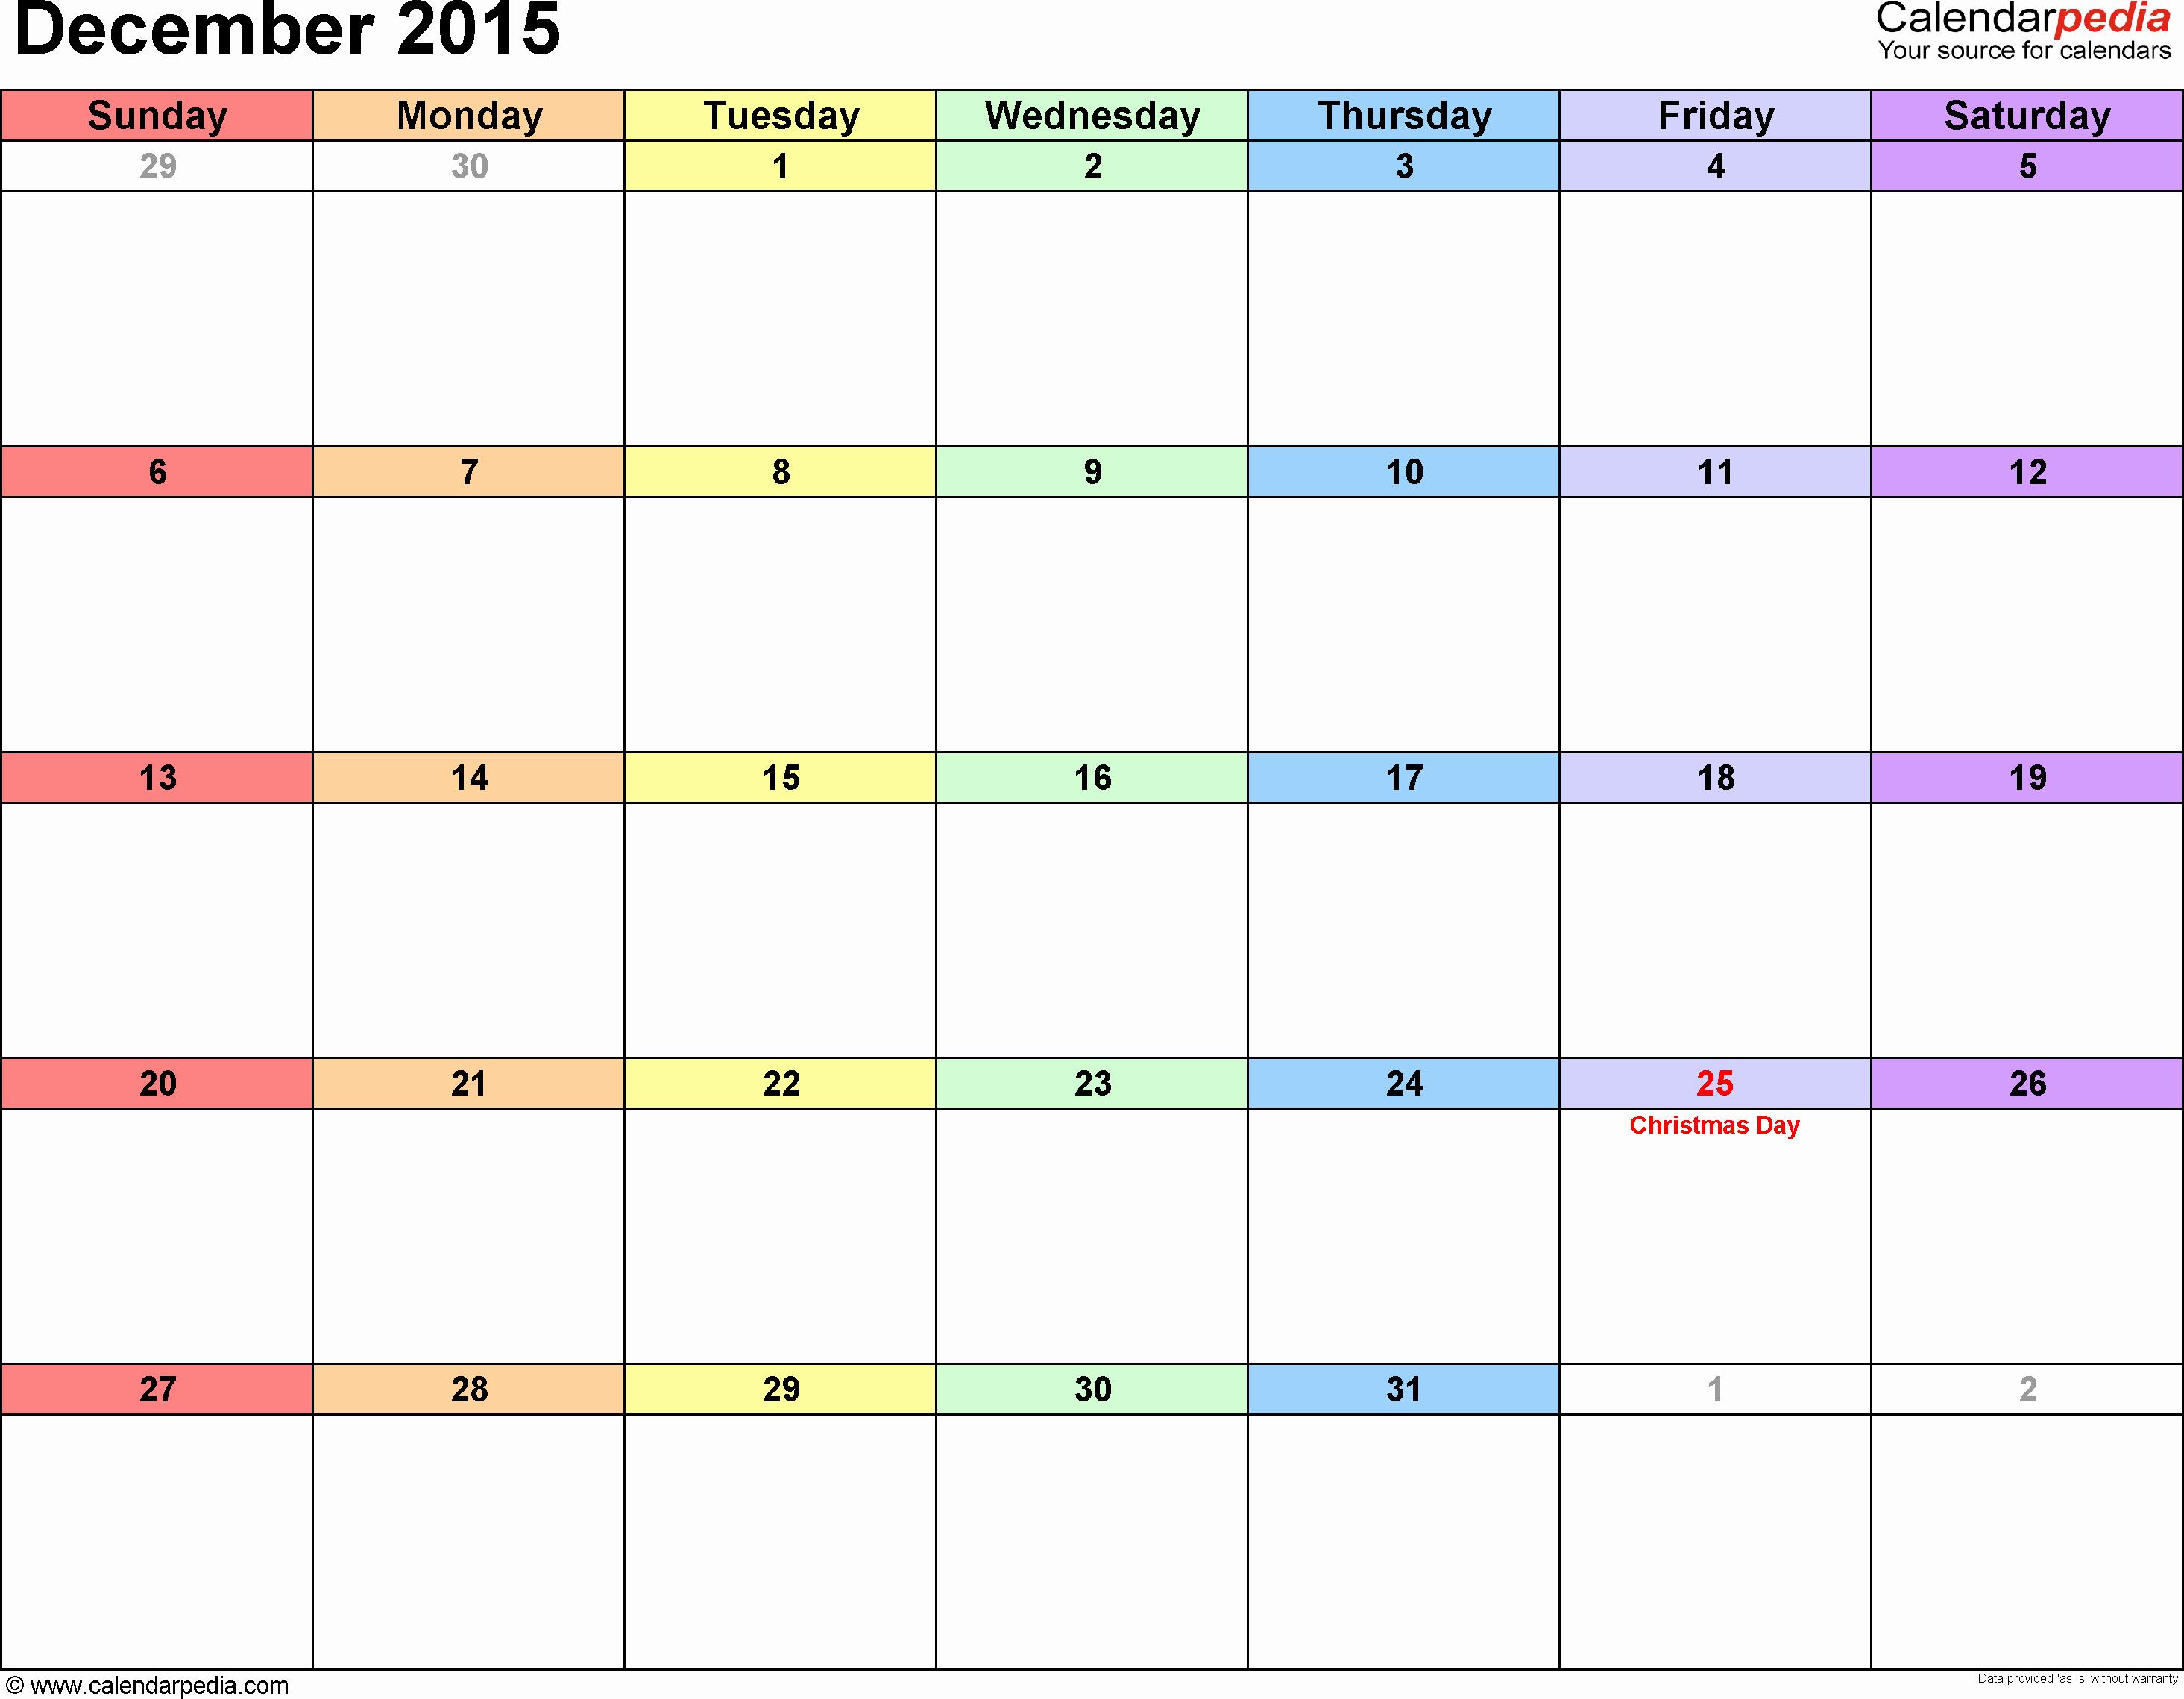 2015 Yearly Calendar Printable Landscape Unique December 2015 Calendars for Word Excel & Pdf